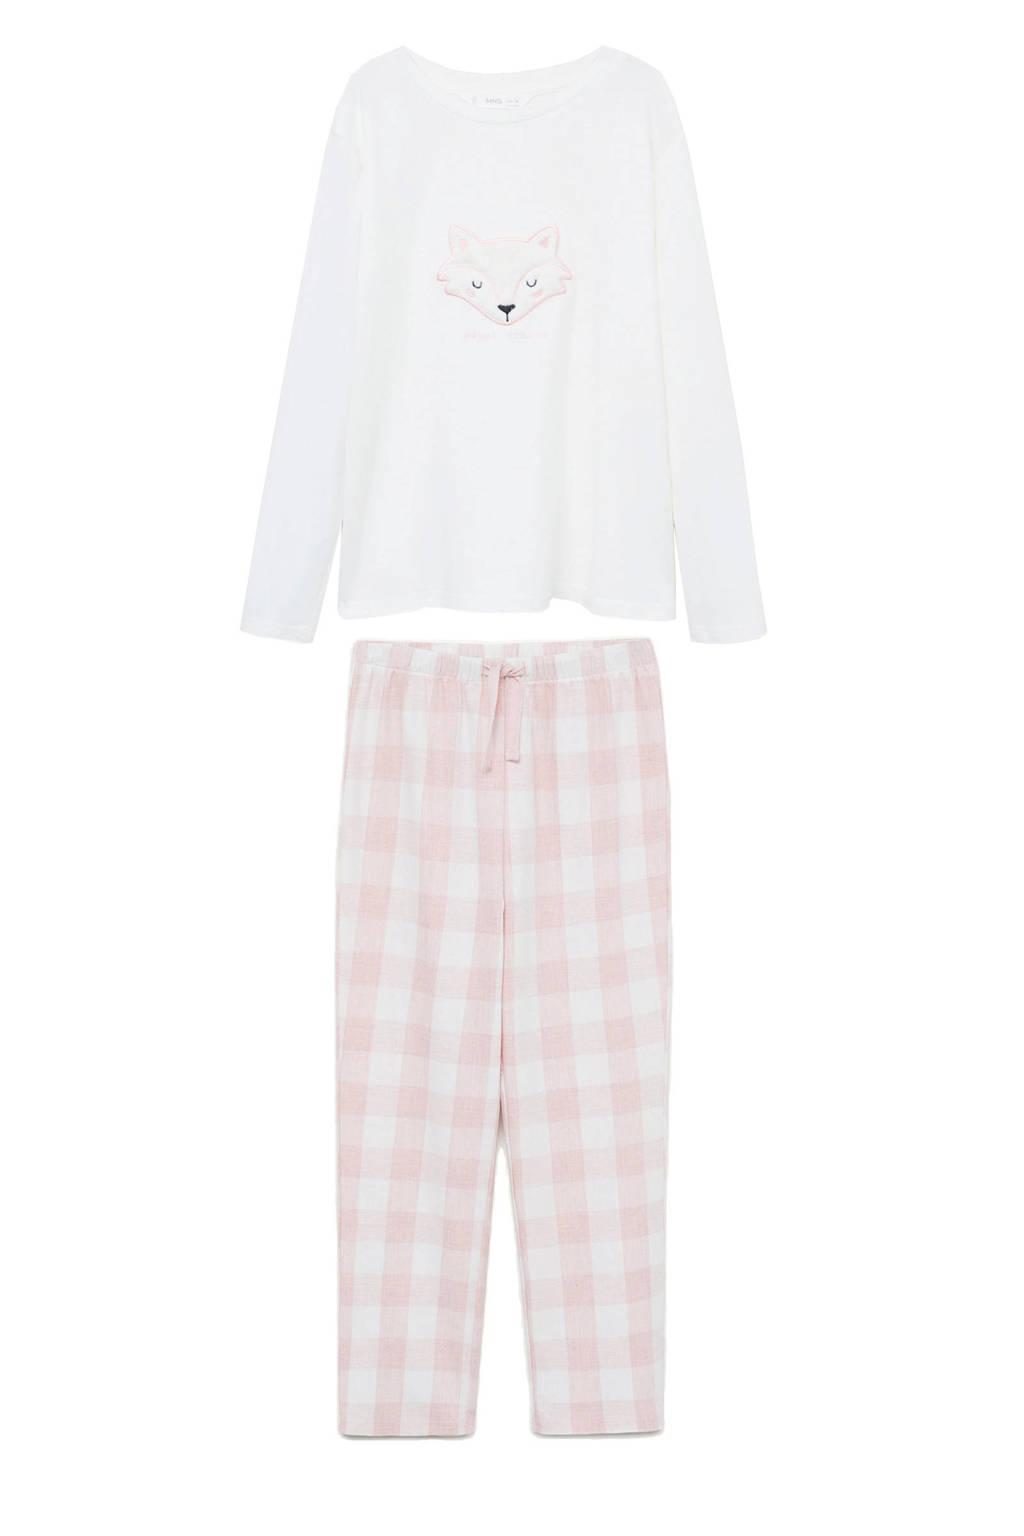 Mango Kids pyjama met print roze/wit, Roze/wit